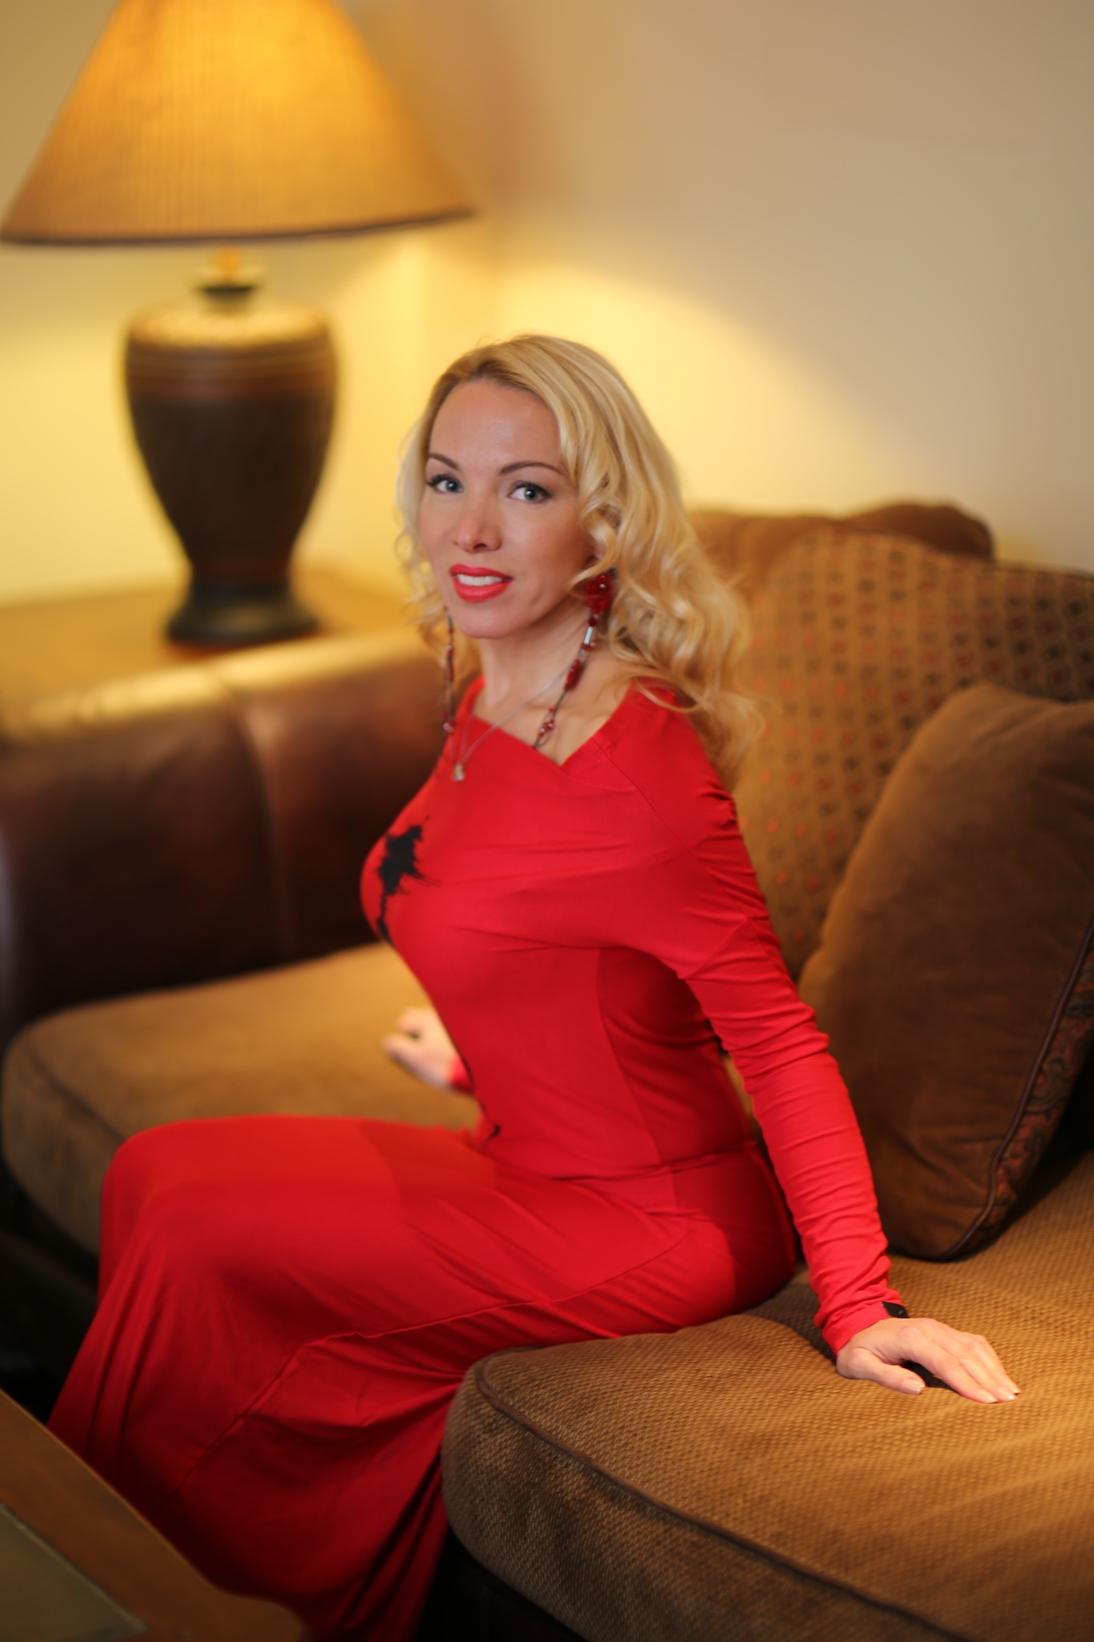 Foto: Gabrielė Janonytė